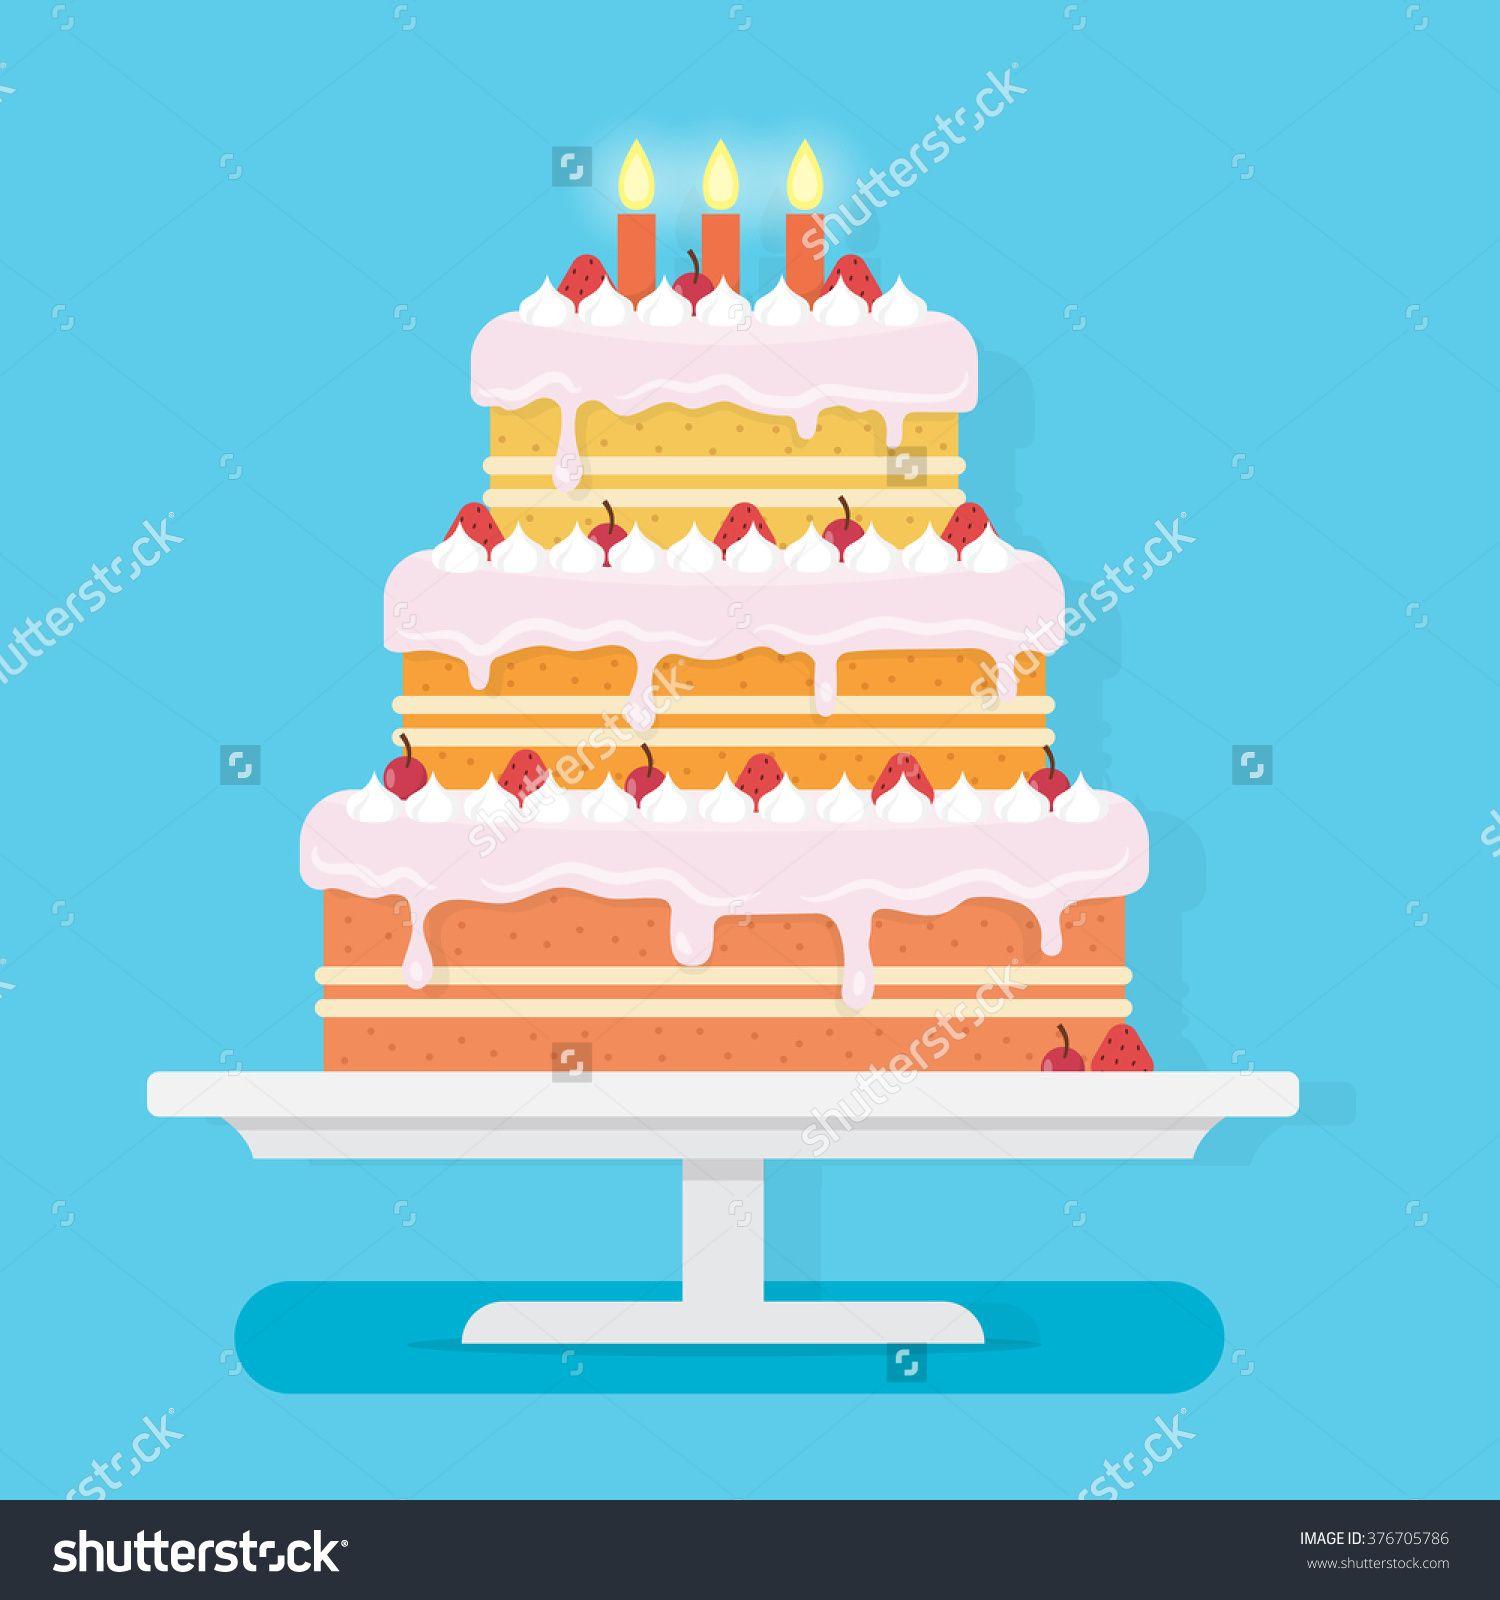 Happy Birthday Cake Party And Celebration Design Elements Flat